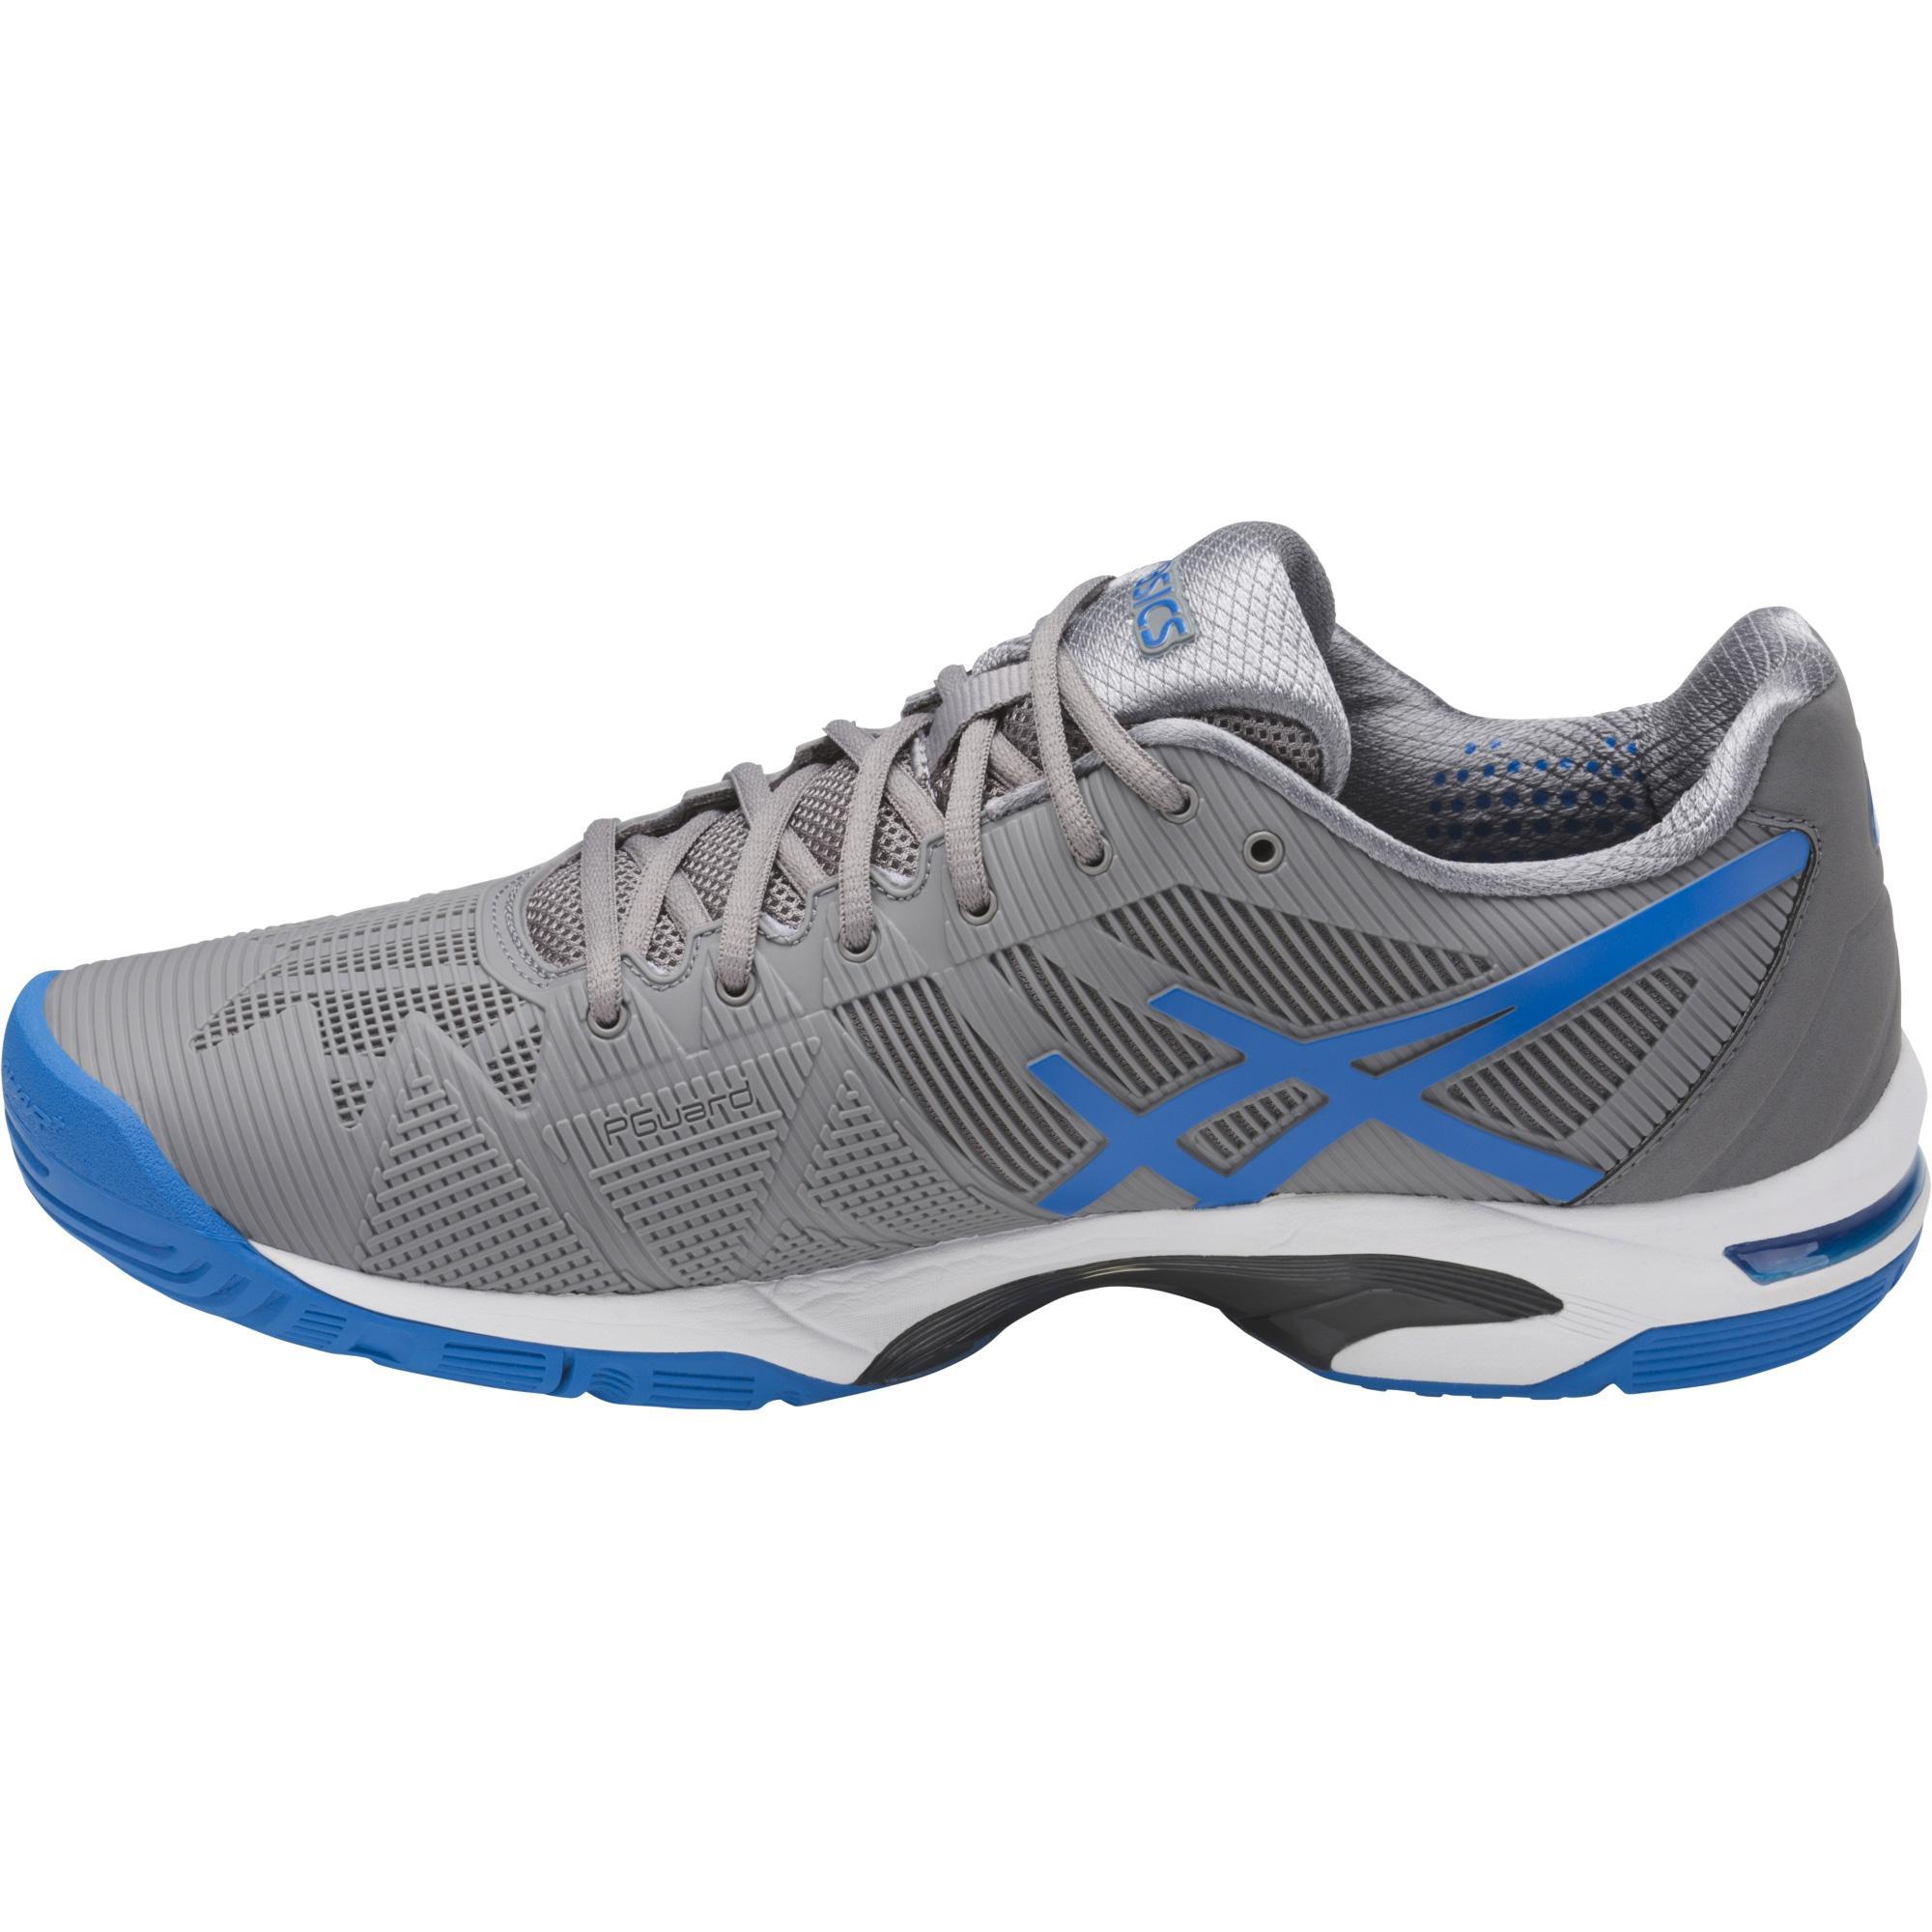 innovative design 59cdc 0c134 Asics Mens GEL-Solution Speed 3 Tennis Shoes - Grey Blue